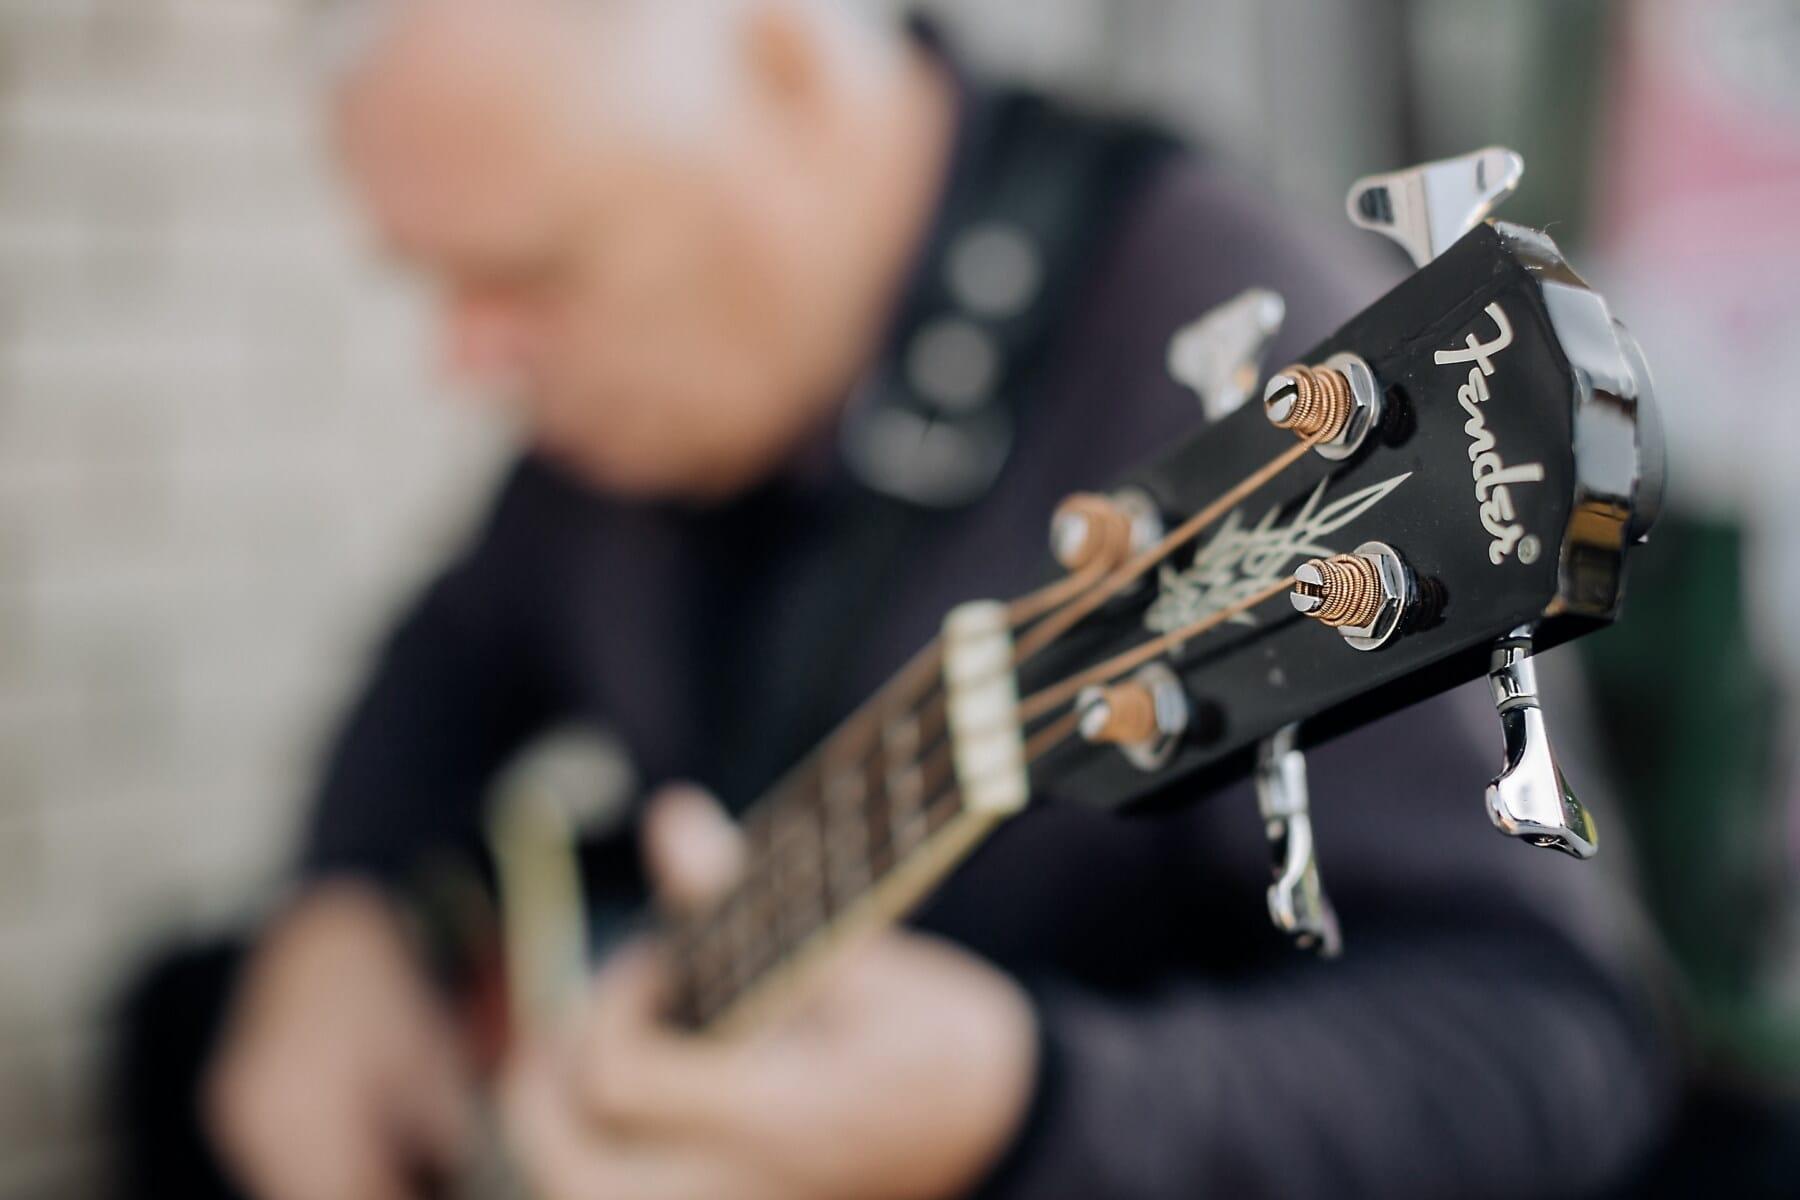 guitare, guitariste, fils, en acier inoxydable, fermer, chaîne, musique, musical, musicien, instrument